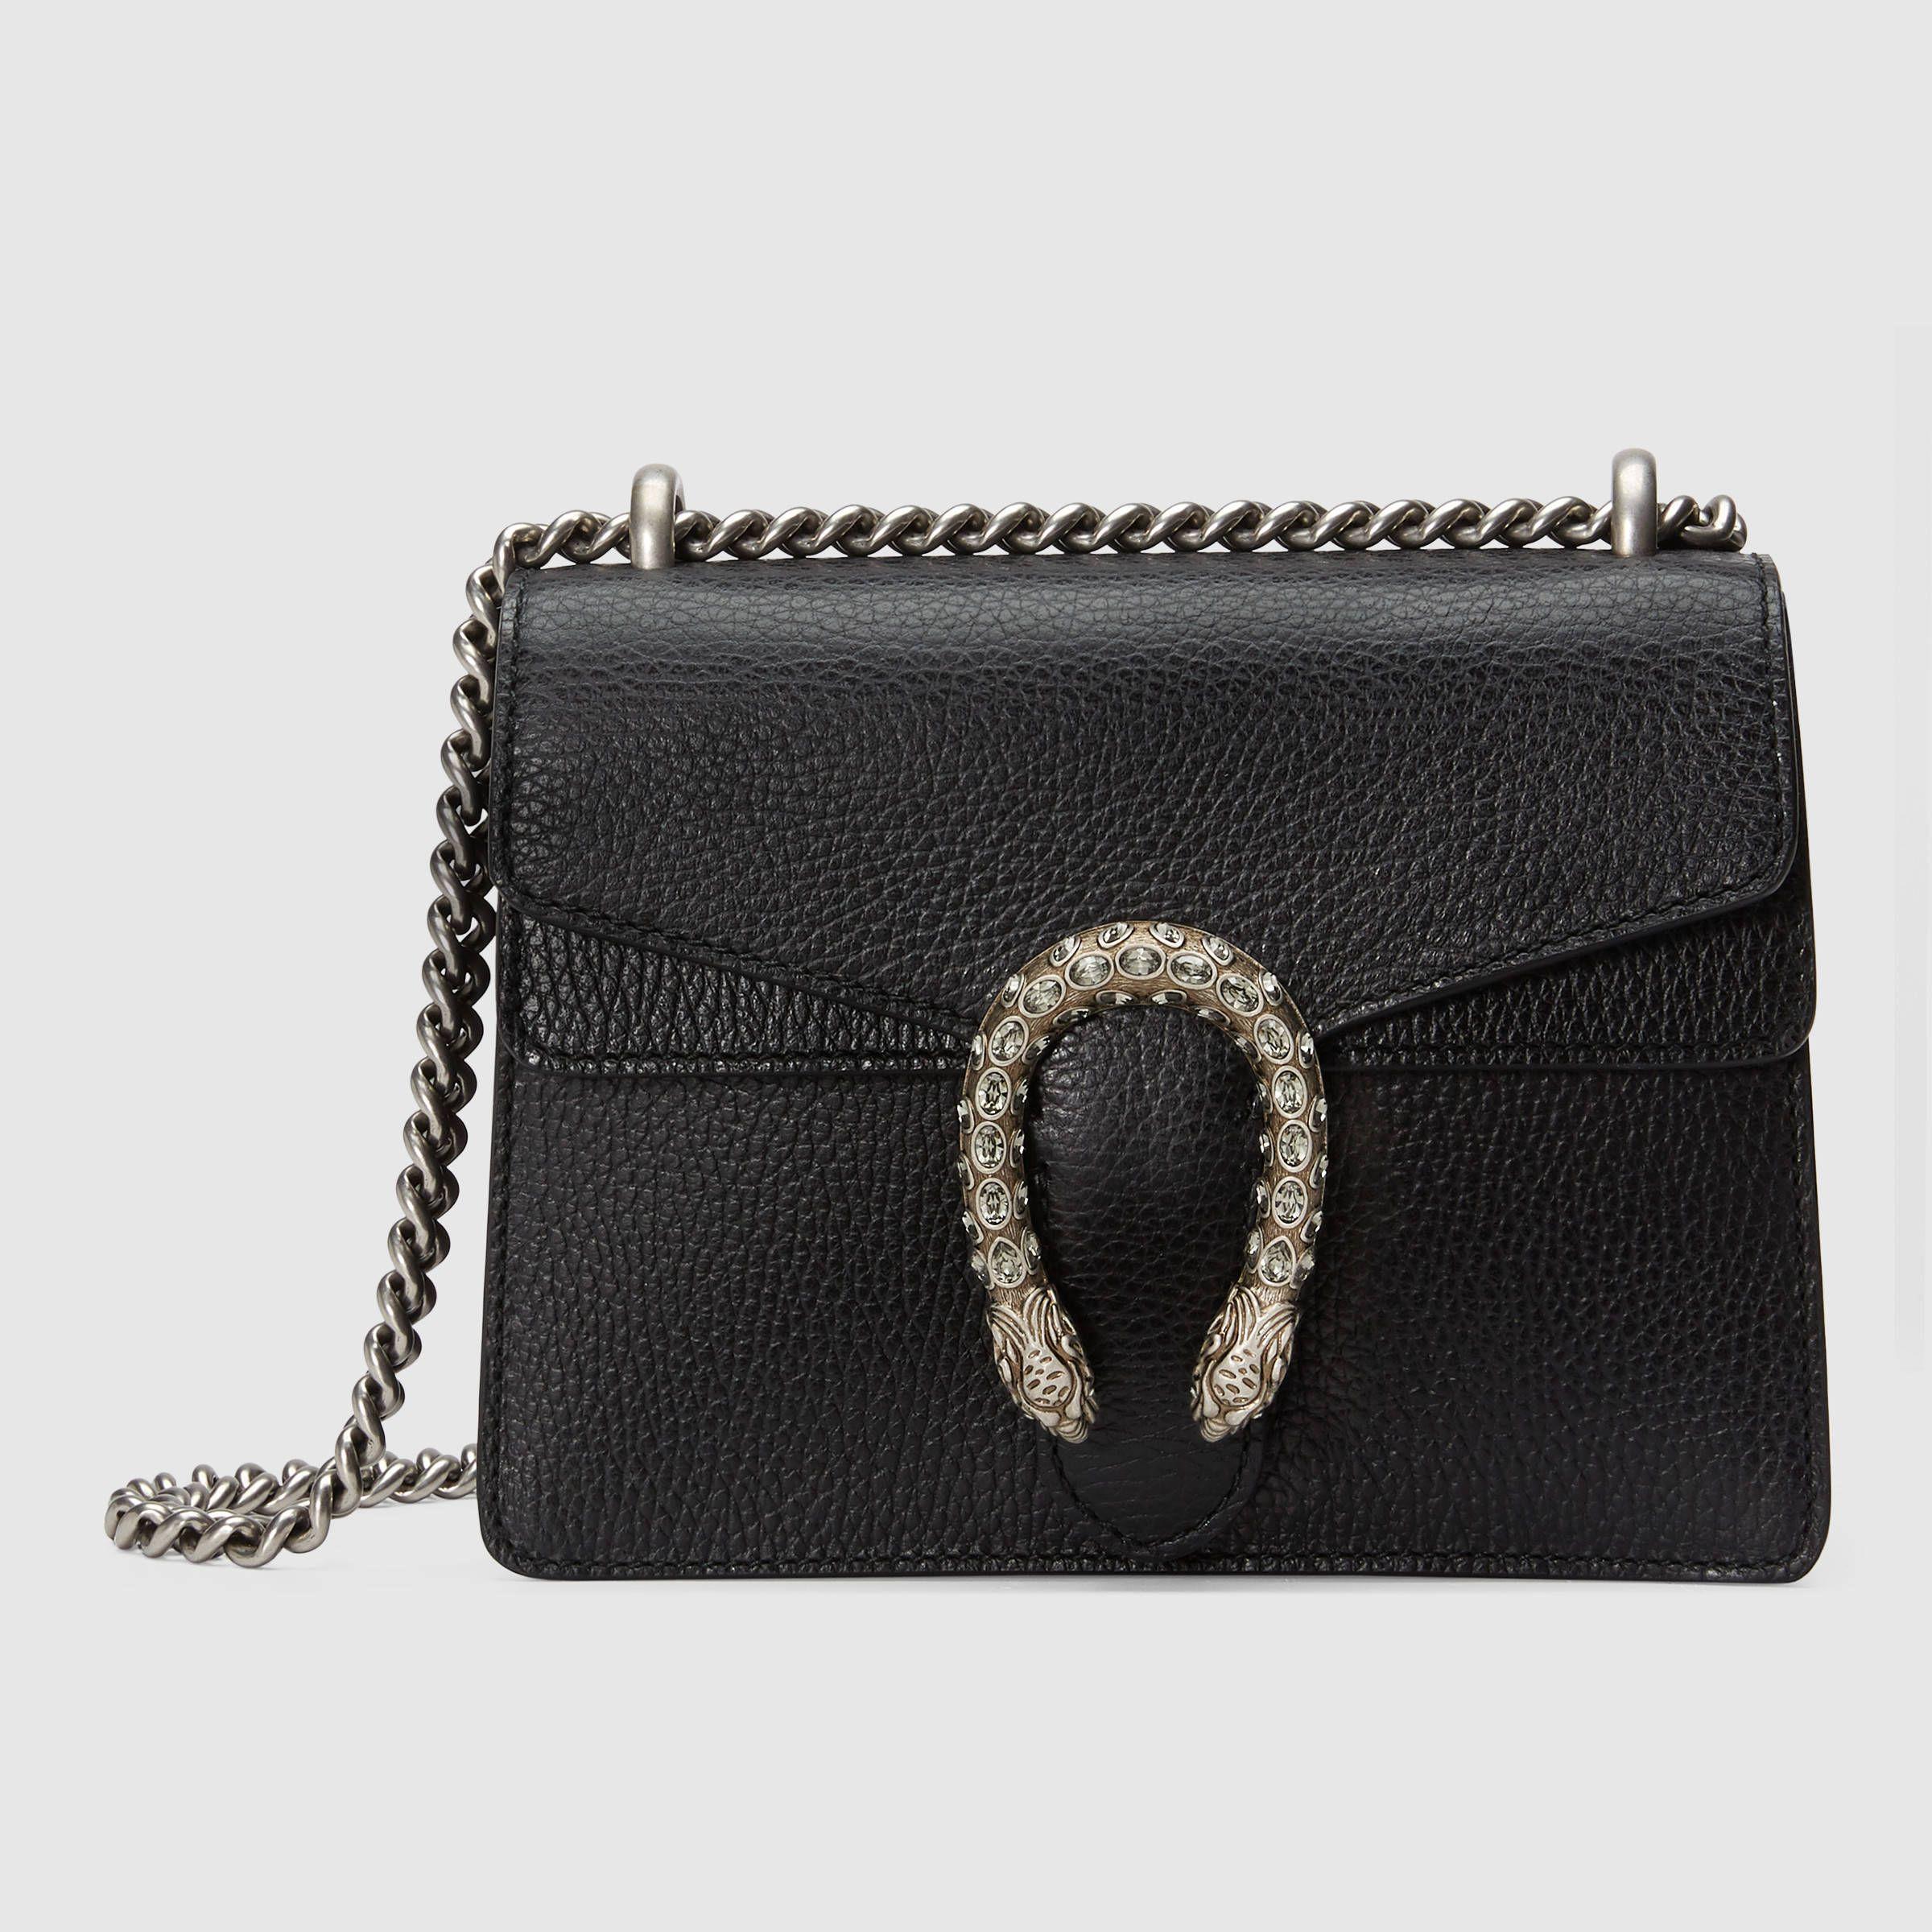 18c9c9743f199b Dionysus leather mini bag Gucci Dionysus Black, Purses And Handbags, Gucci  Handbags, Gucci